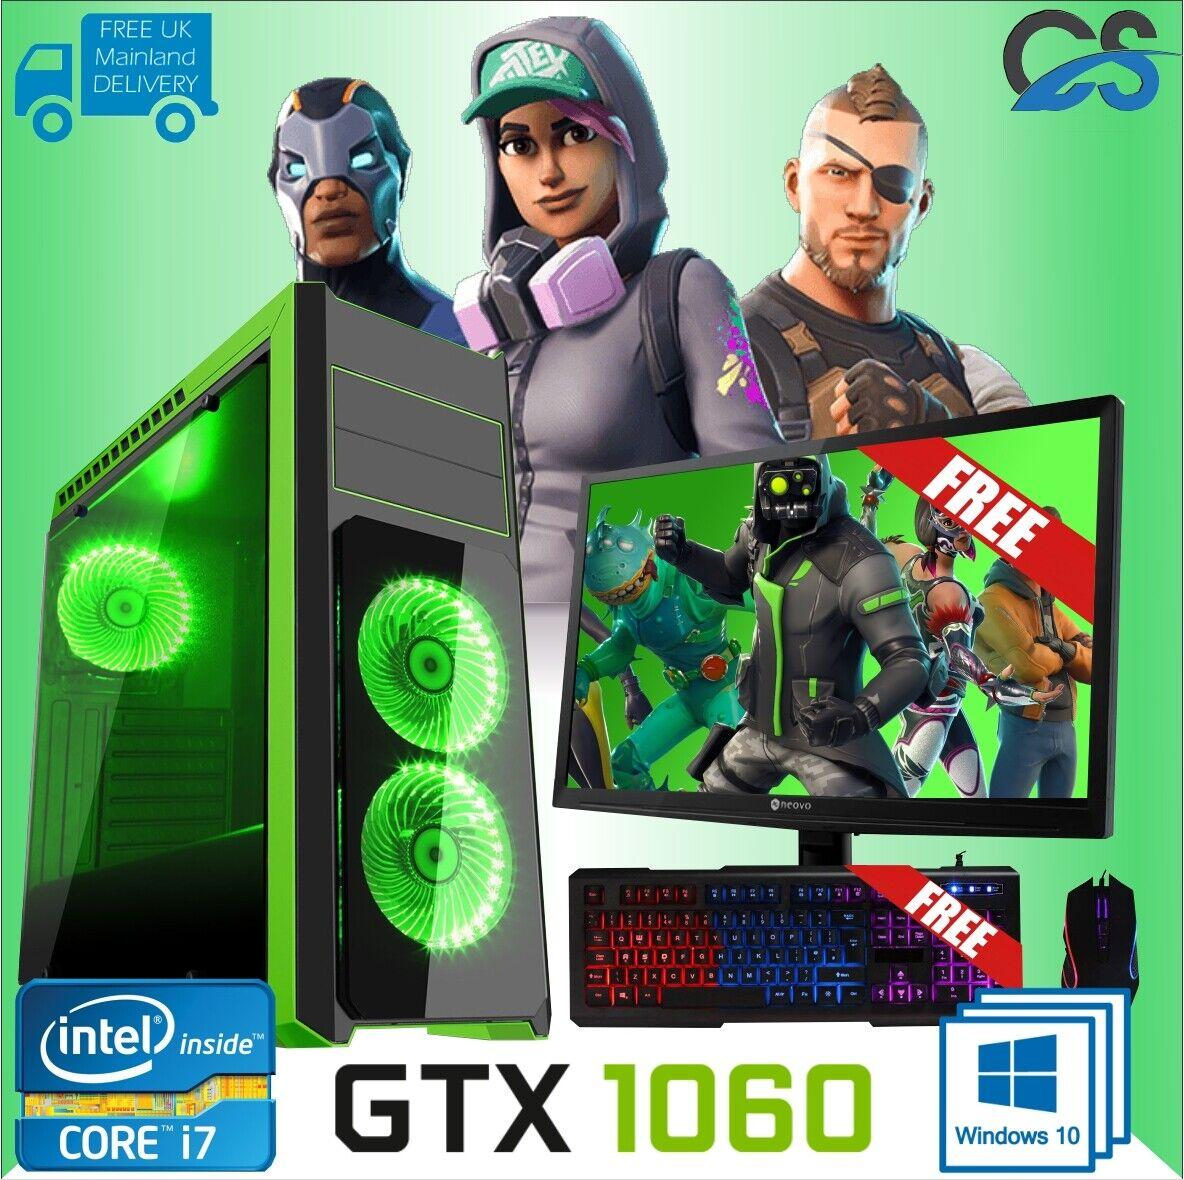 Computer Games - Gaming PC Computer Bundle Intel Quad Core i7 16GB 1TB + 240GB SSD 6GBGTX1660 W10